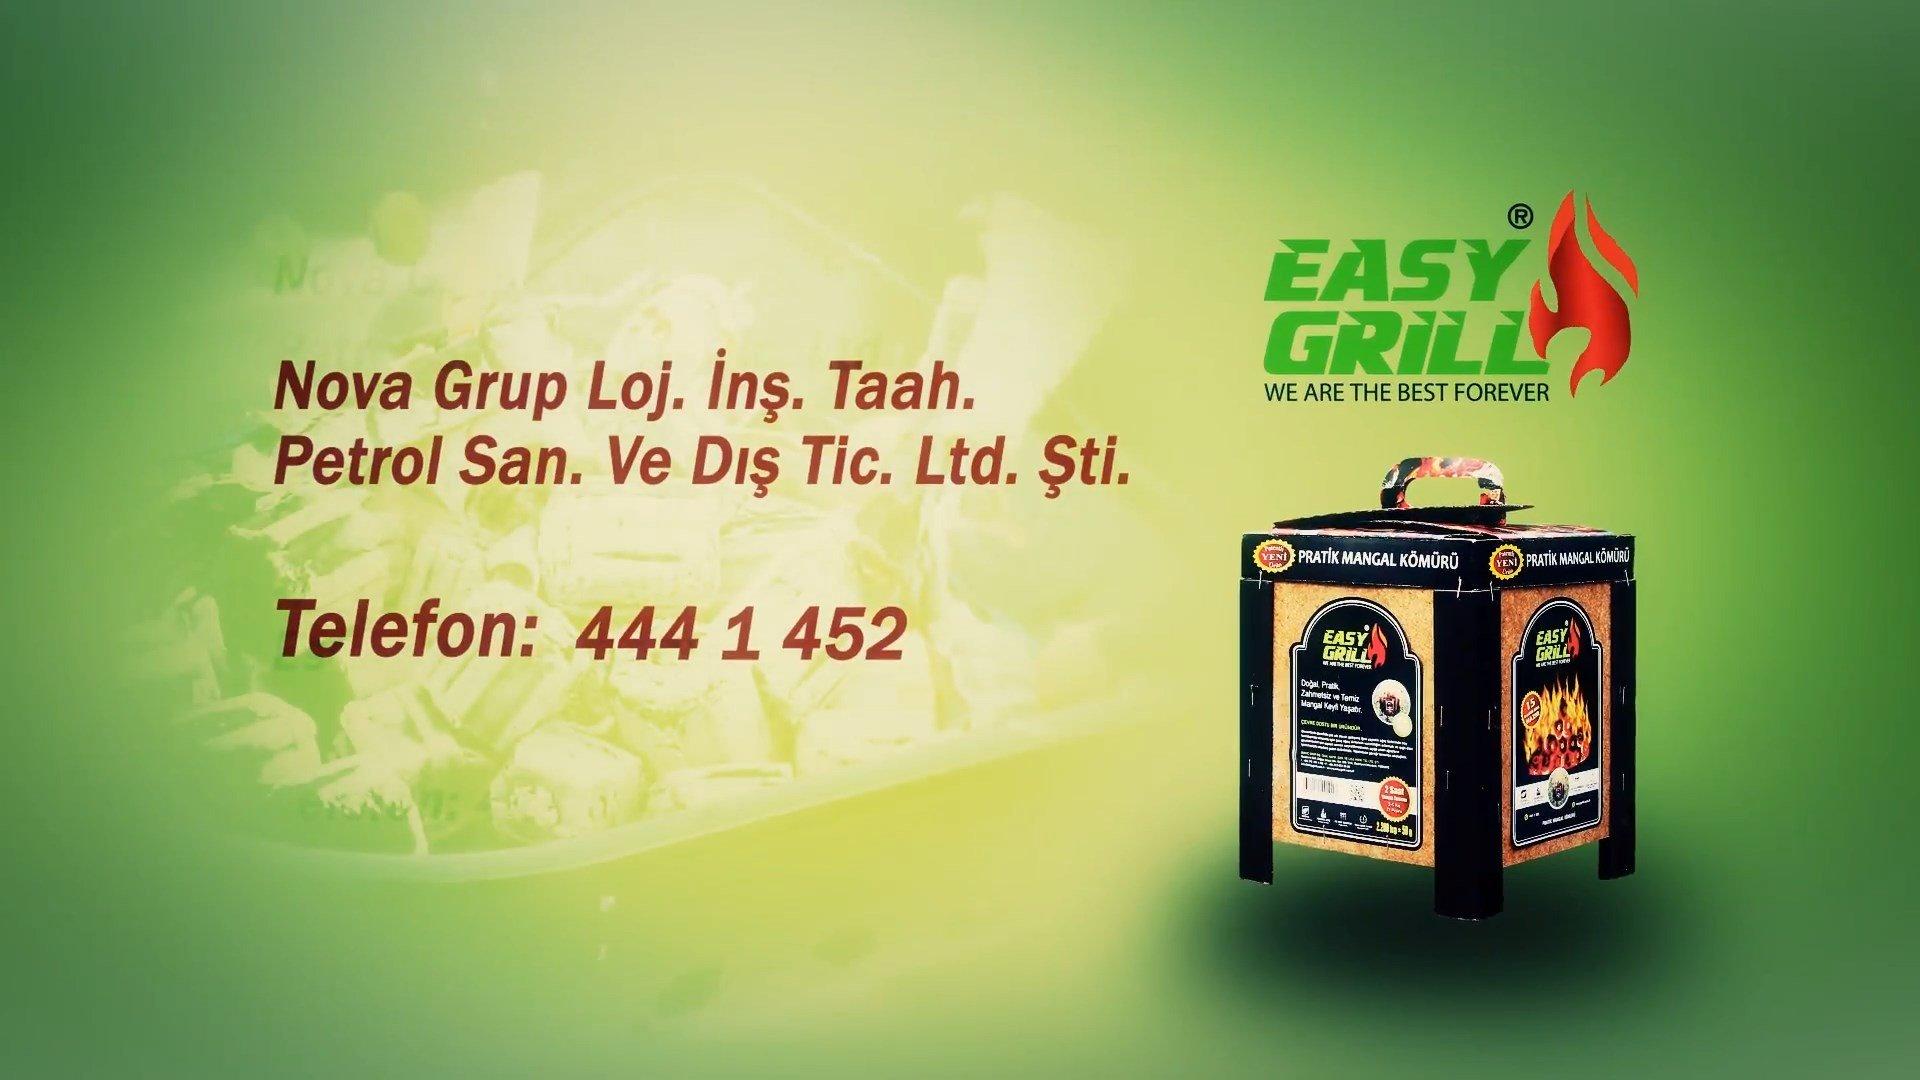 Easy Grill Tanıtım Filmi 14 1920x1080 - Easy Grill Tanıtım Filmi